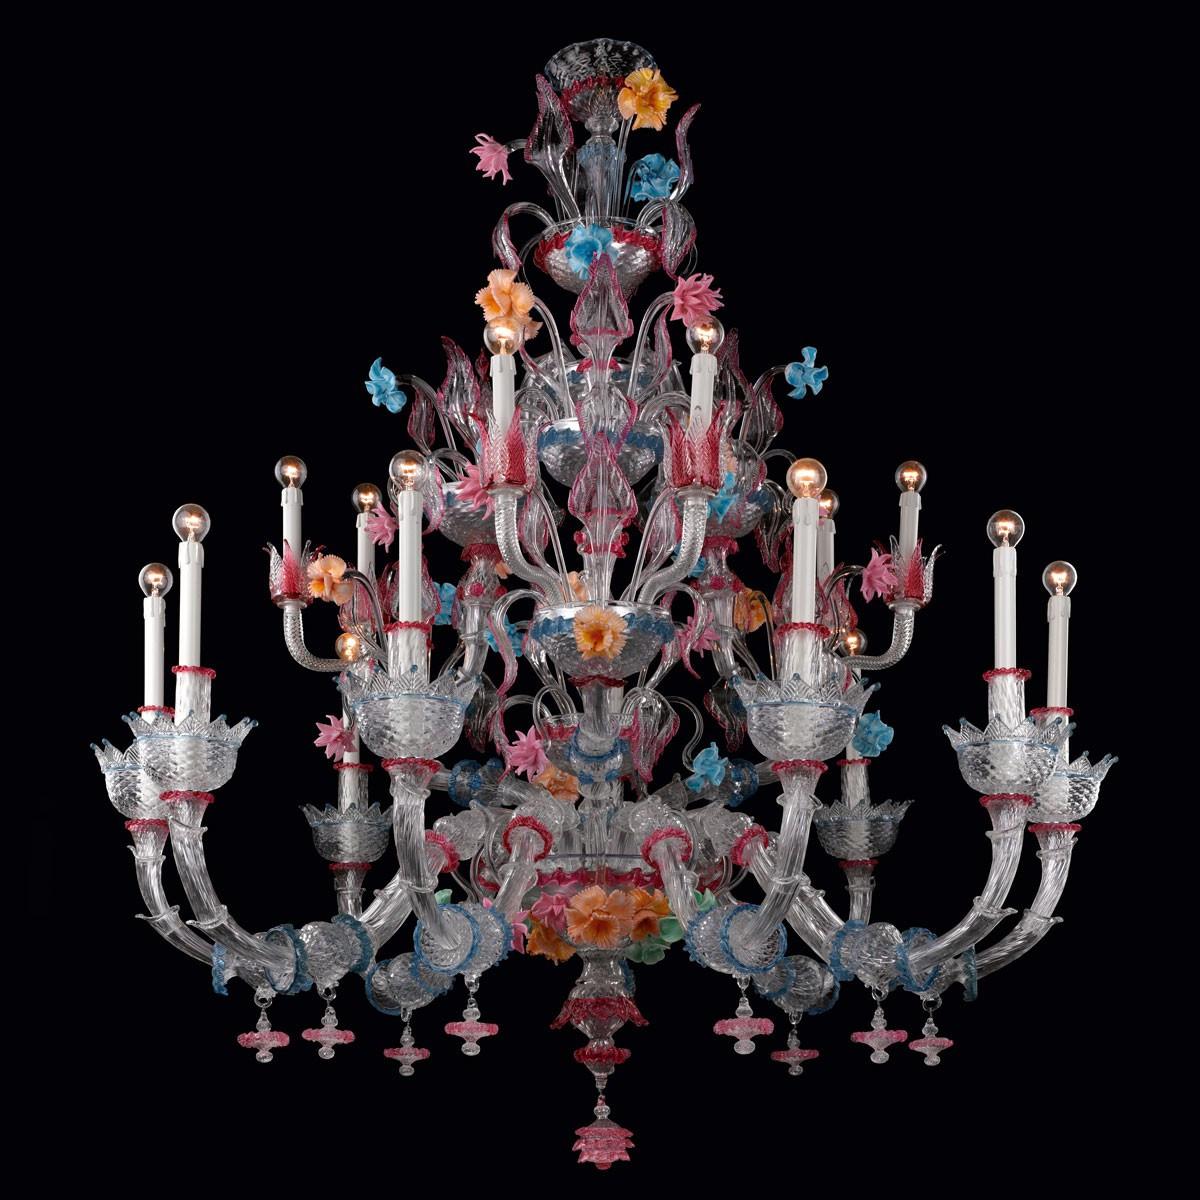 """Romantico"" Murano glas Kronleuchter - 15 flammig"